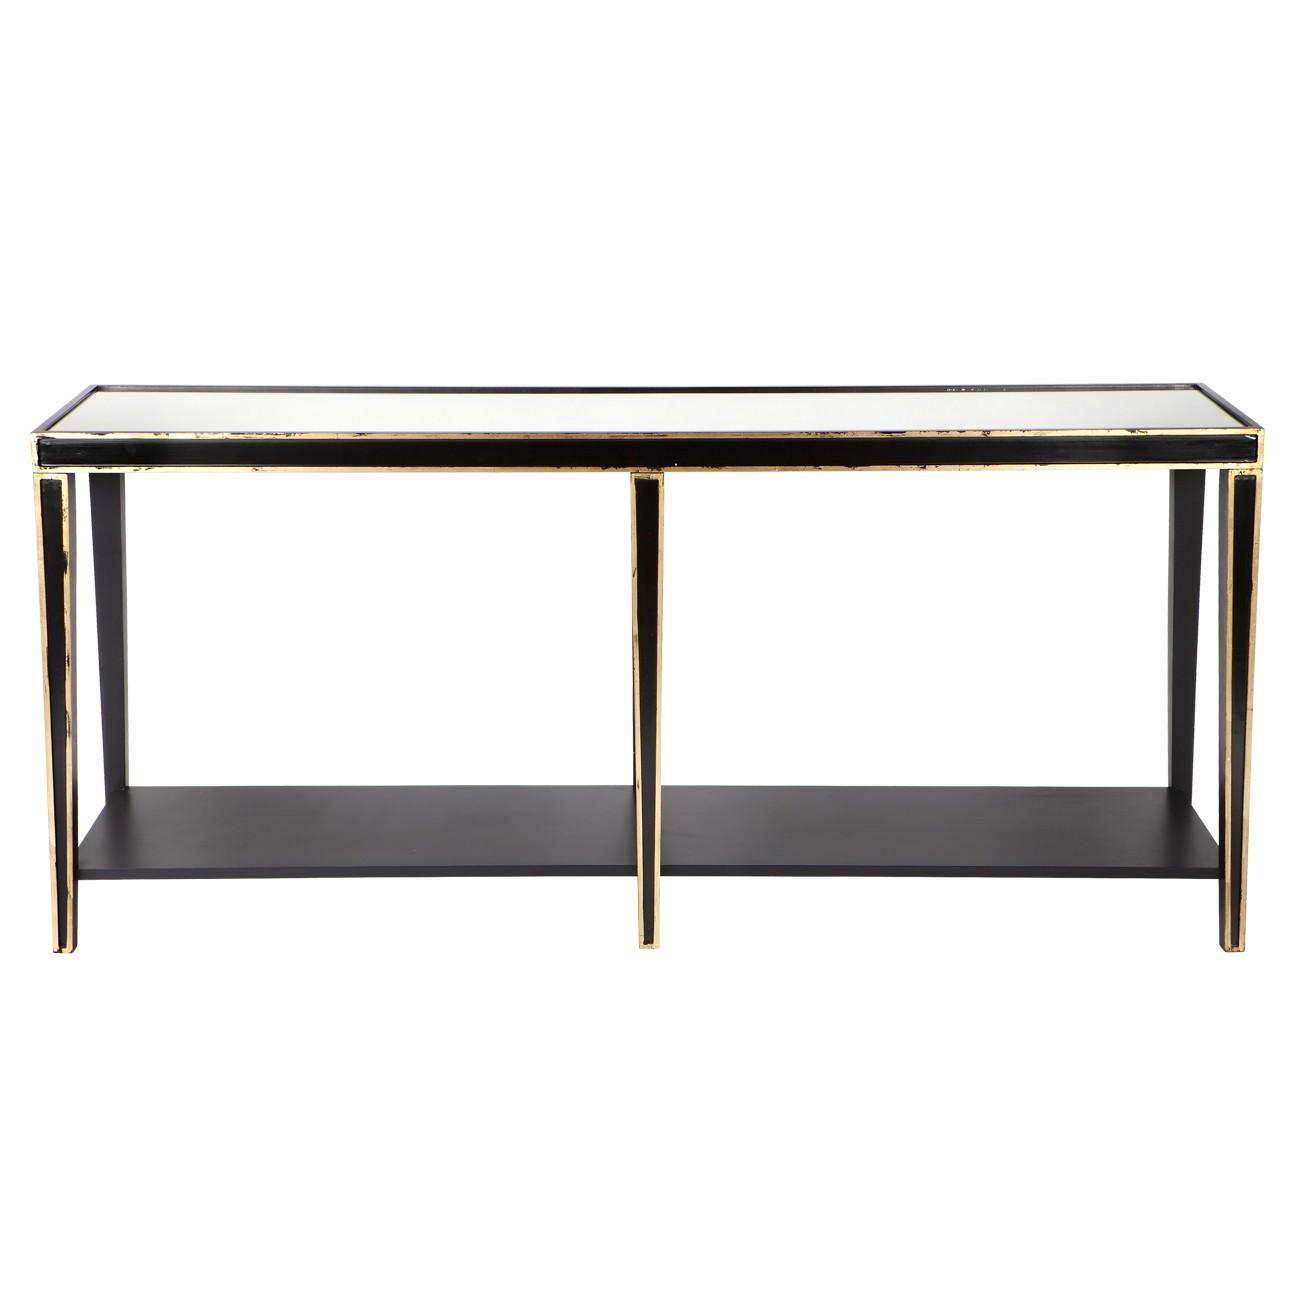 Alexa Mirror Top Wooden Console Table, 180cm